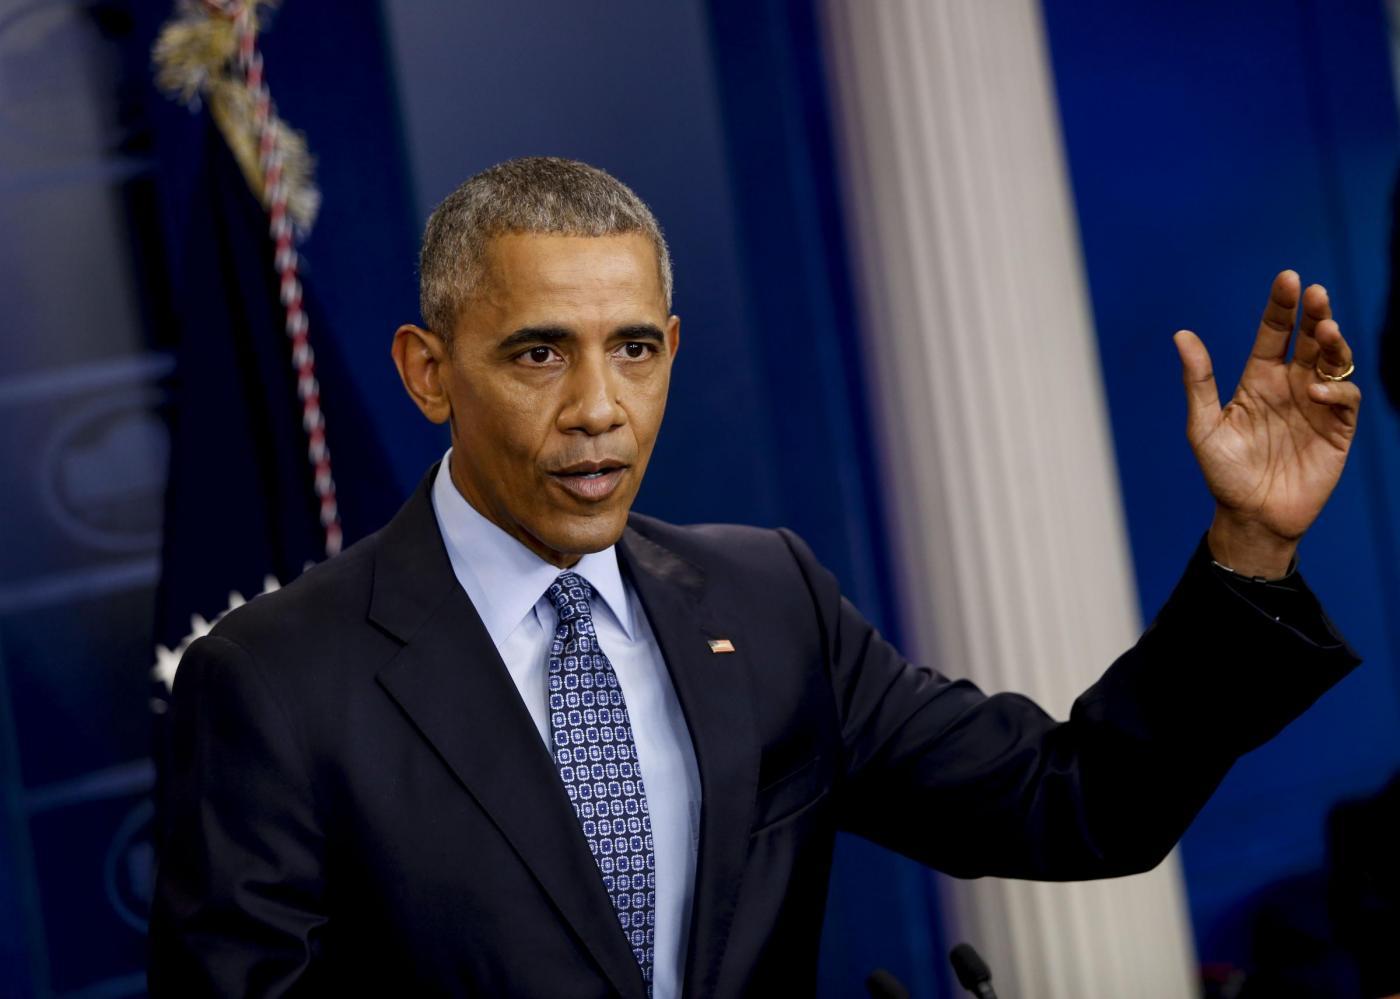 Ultima conferenza stampa per Barack Obama